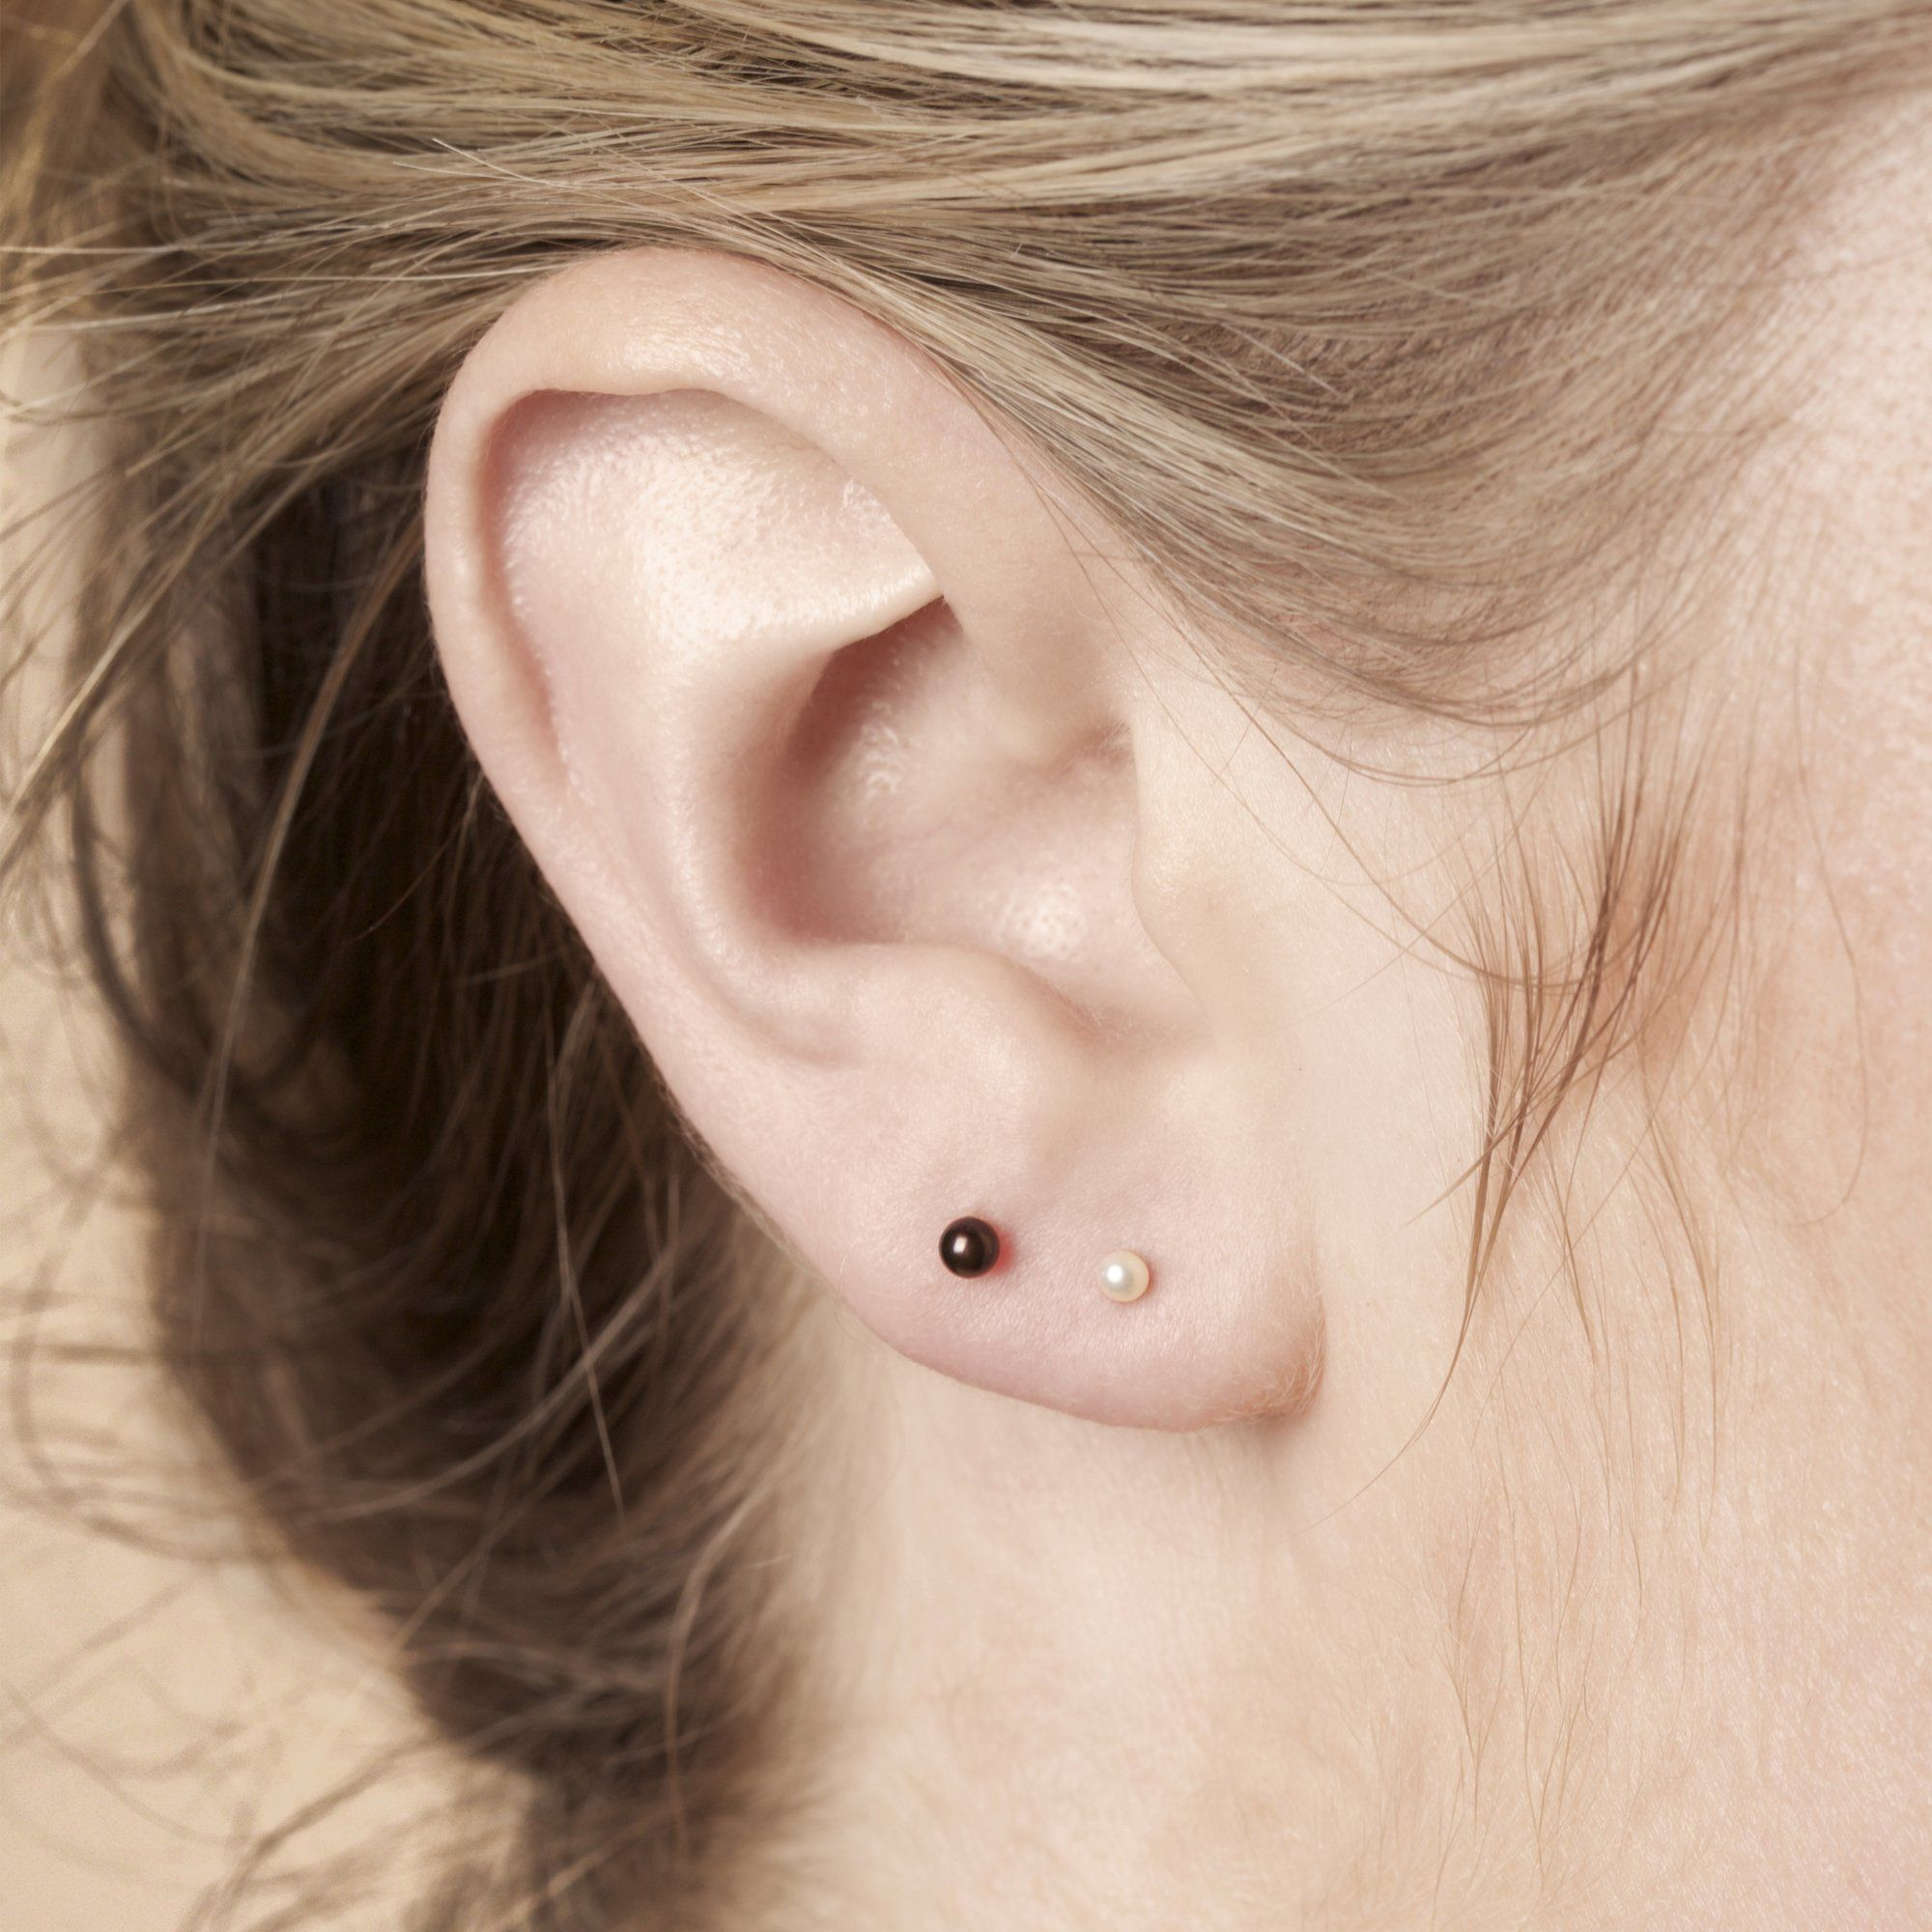 Tiny Pearl Earrings In 2020 Black Pearl Earrings Earrings Pearl Earrings